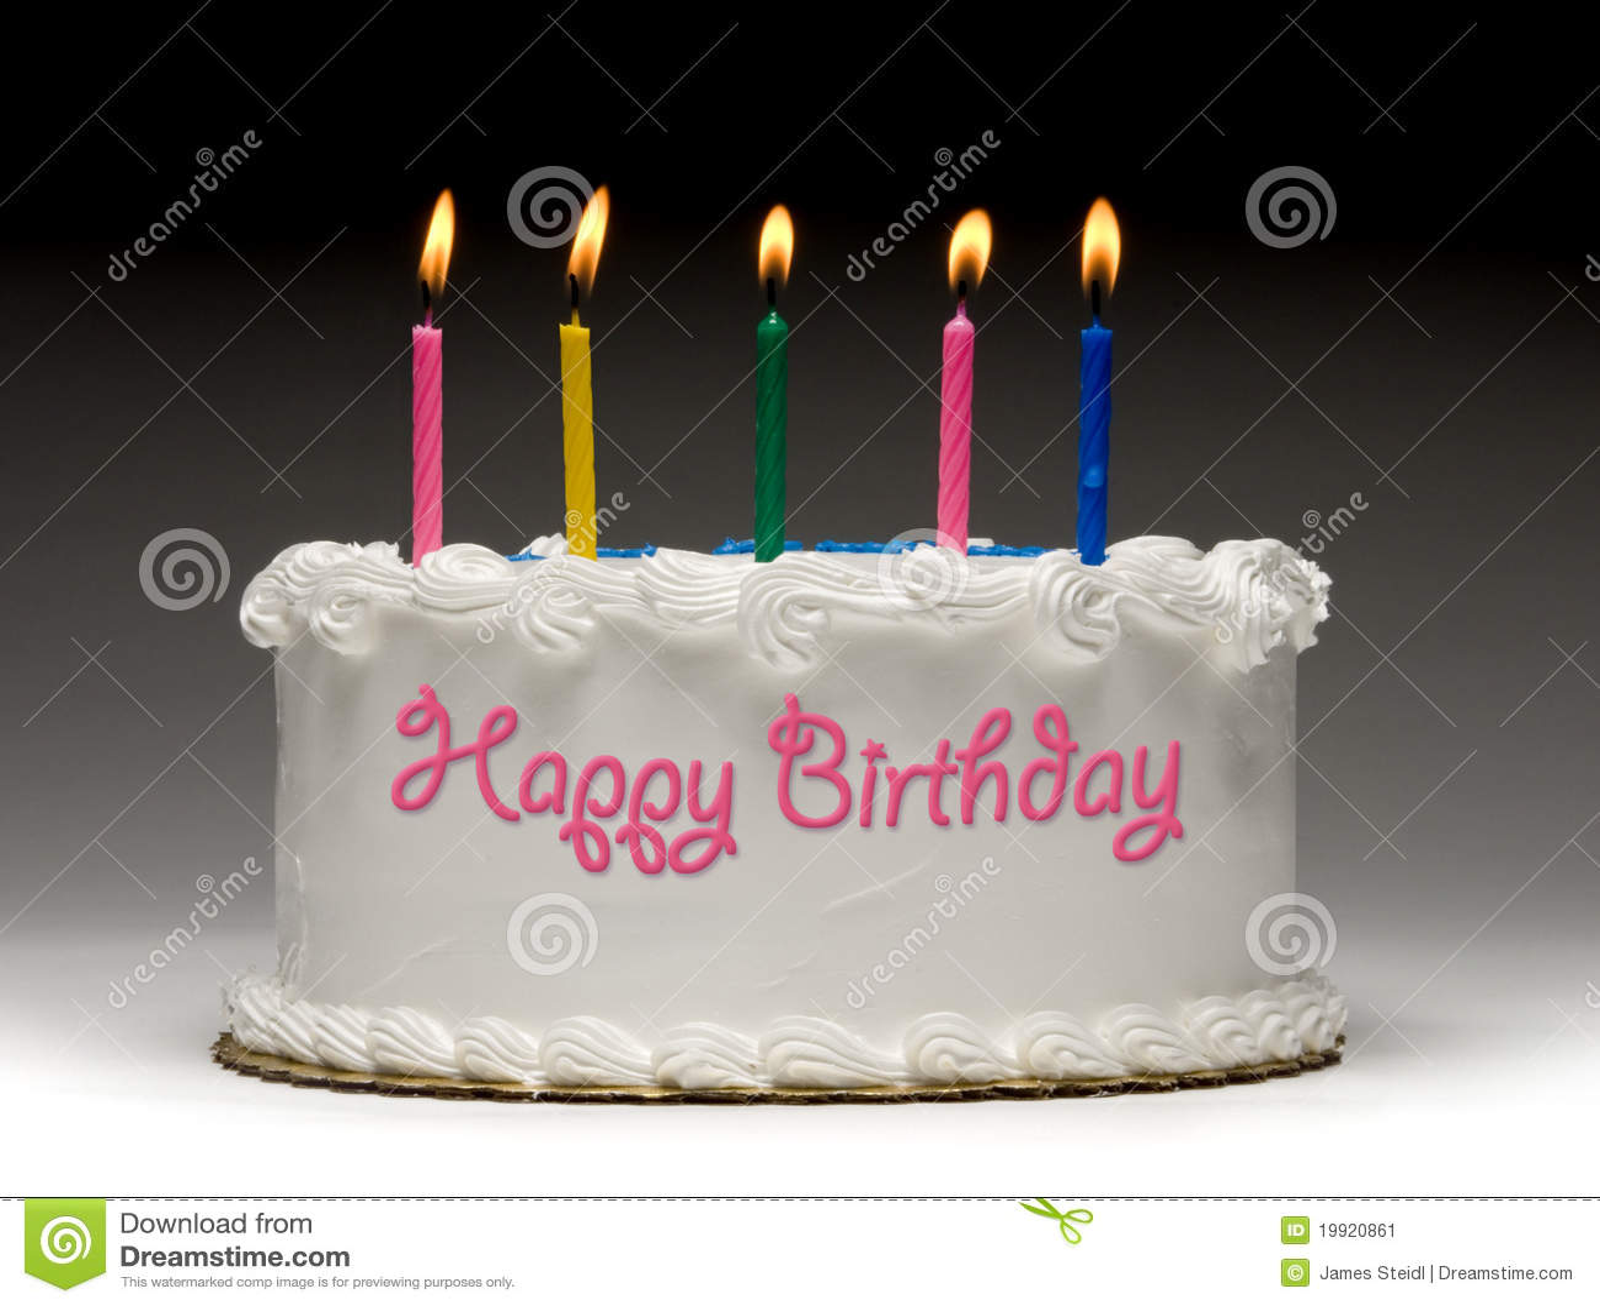 Birthday Cake Profile Stock Image Image Of Flame